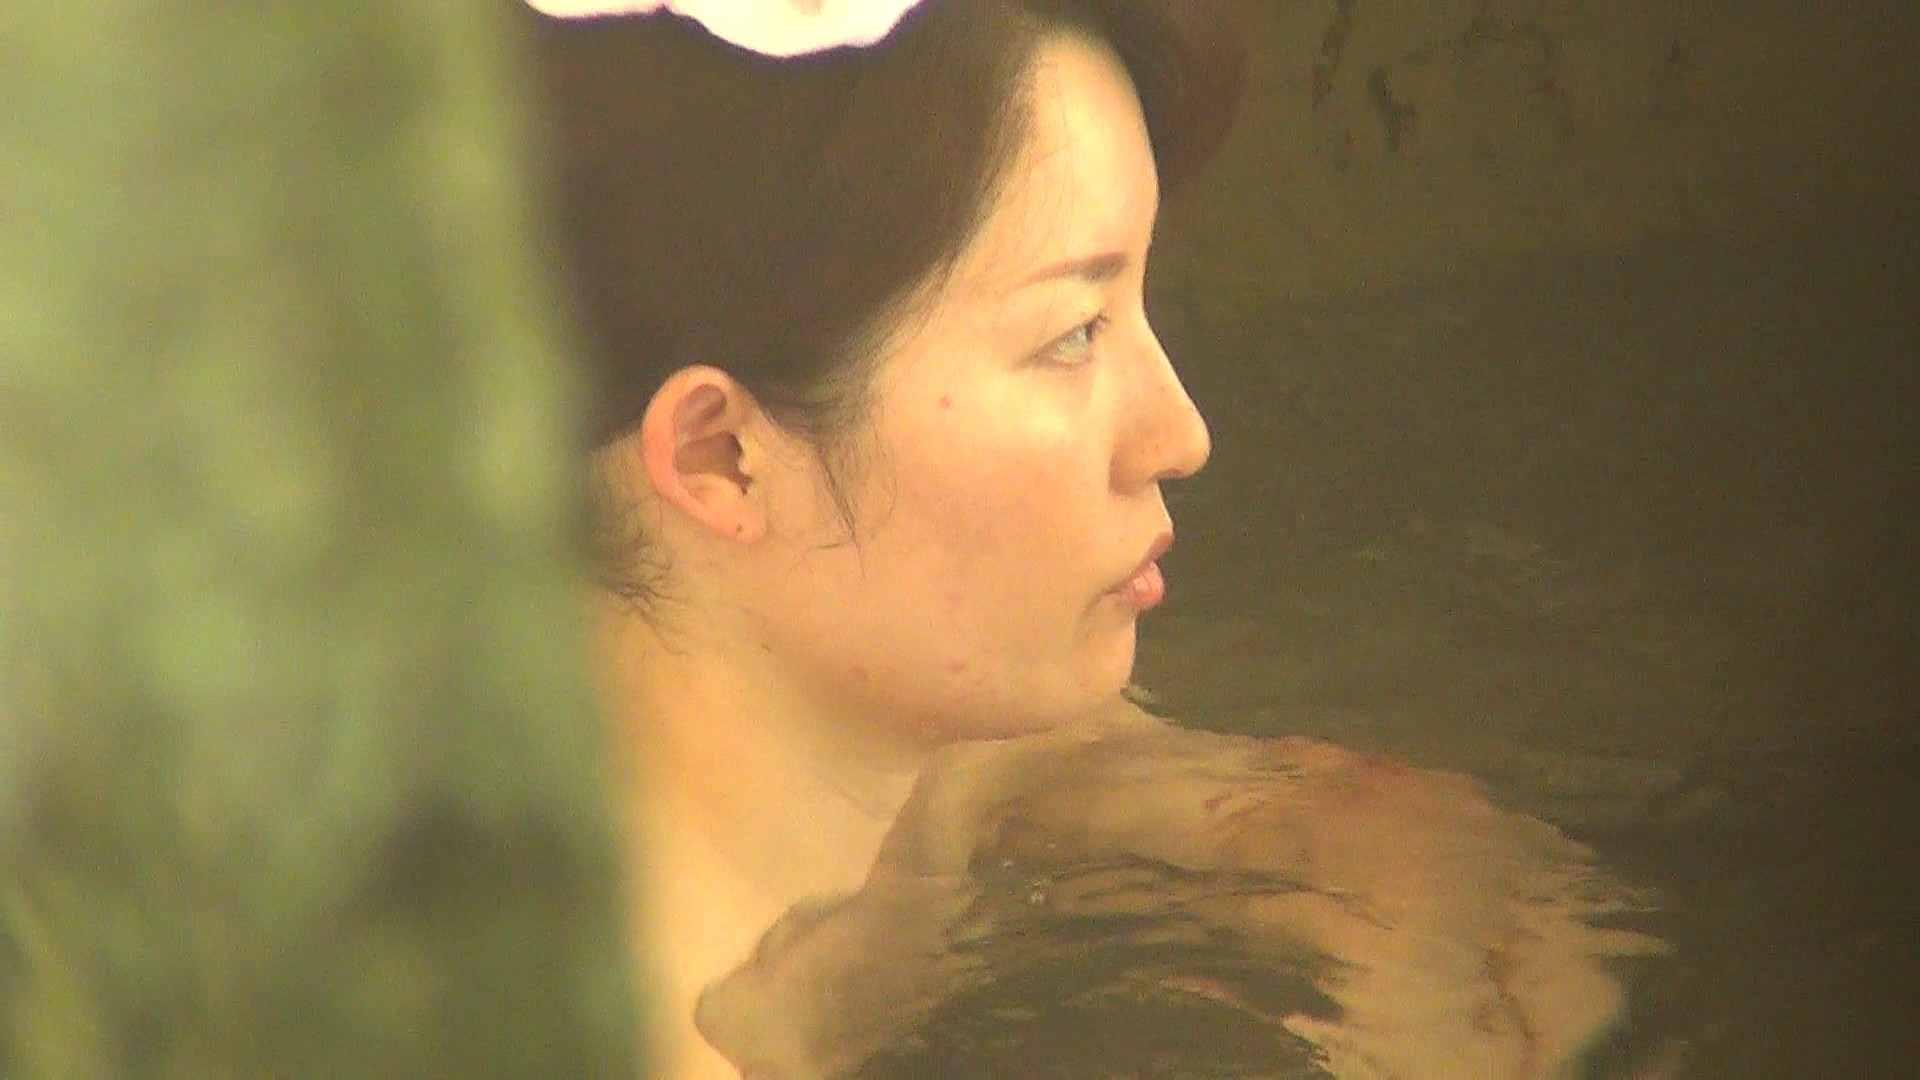 Aquaな露天風呂Vol.301 盗撮  112連発 96